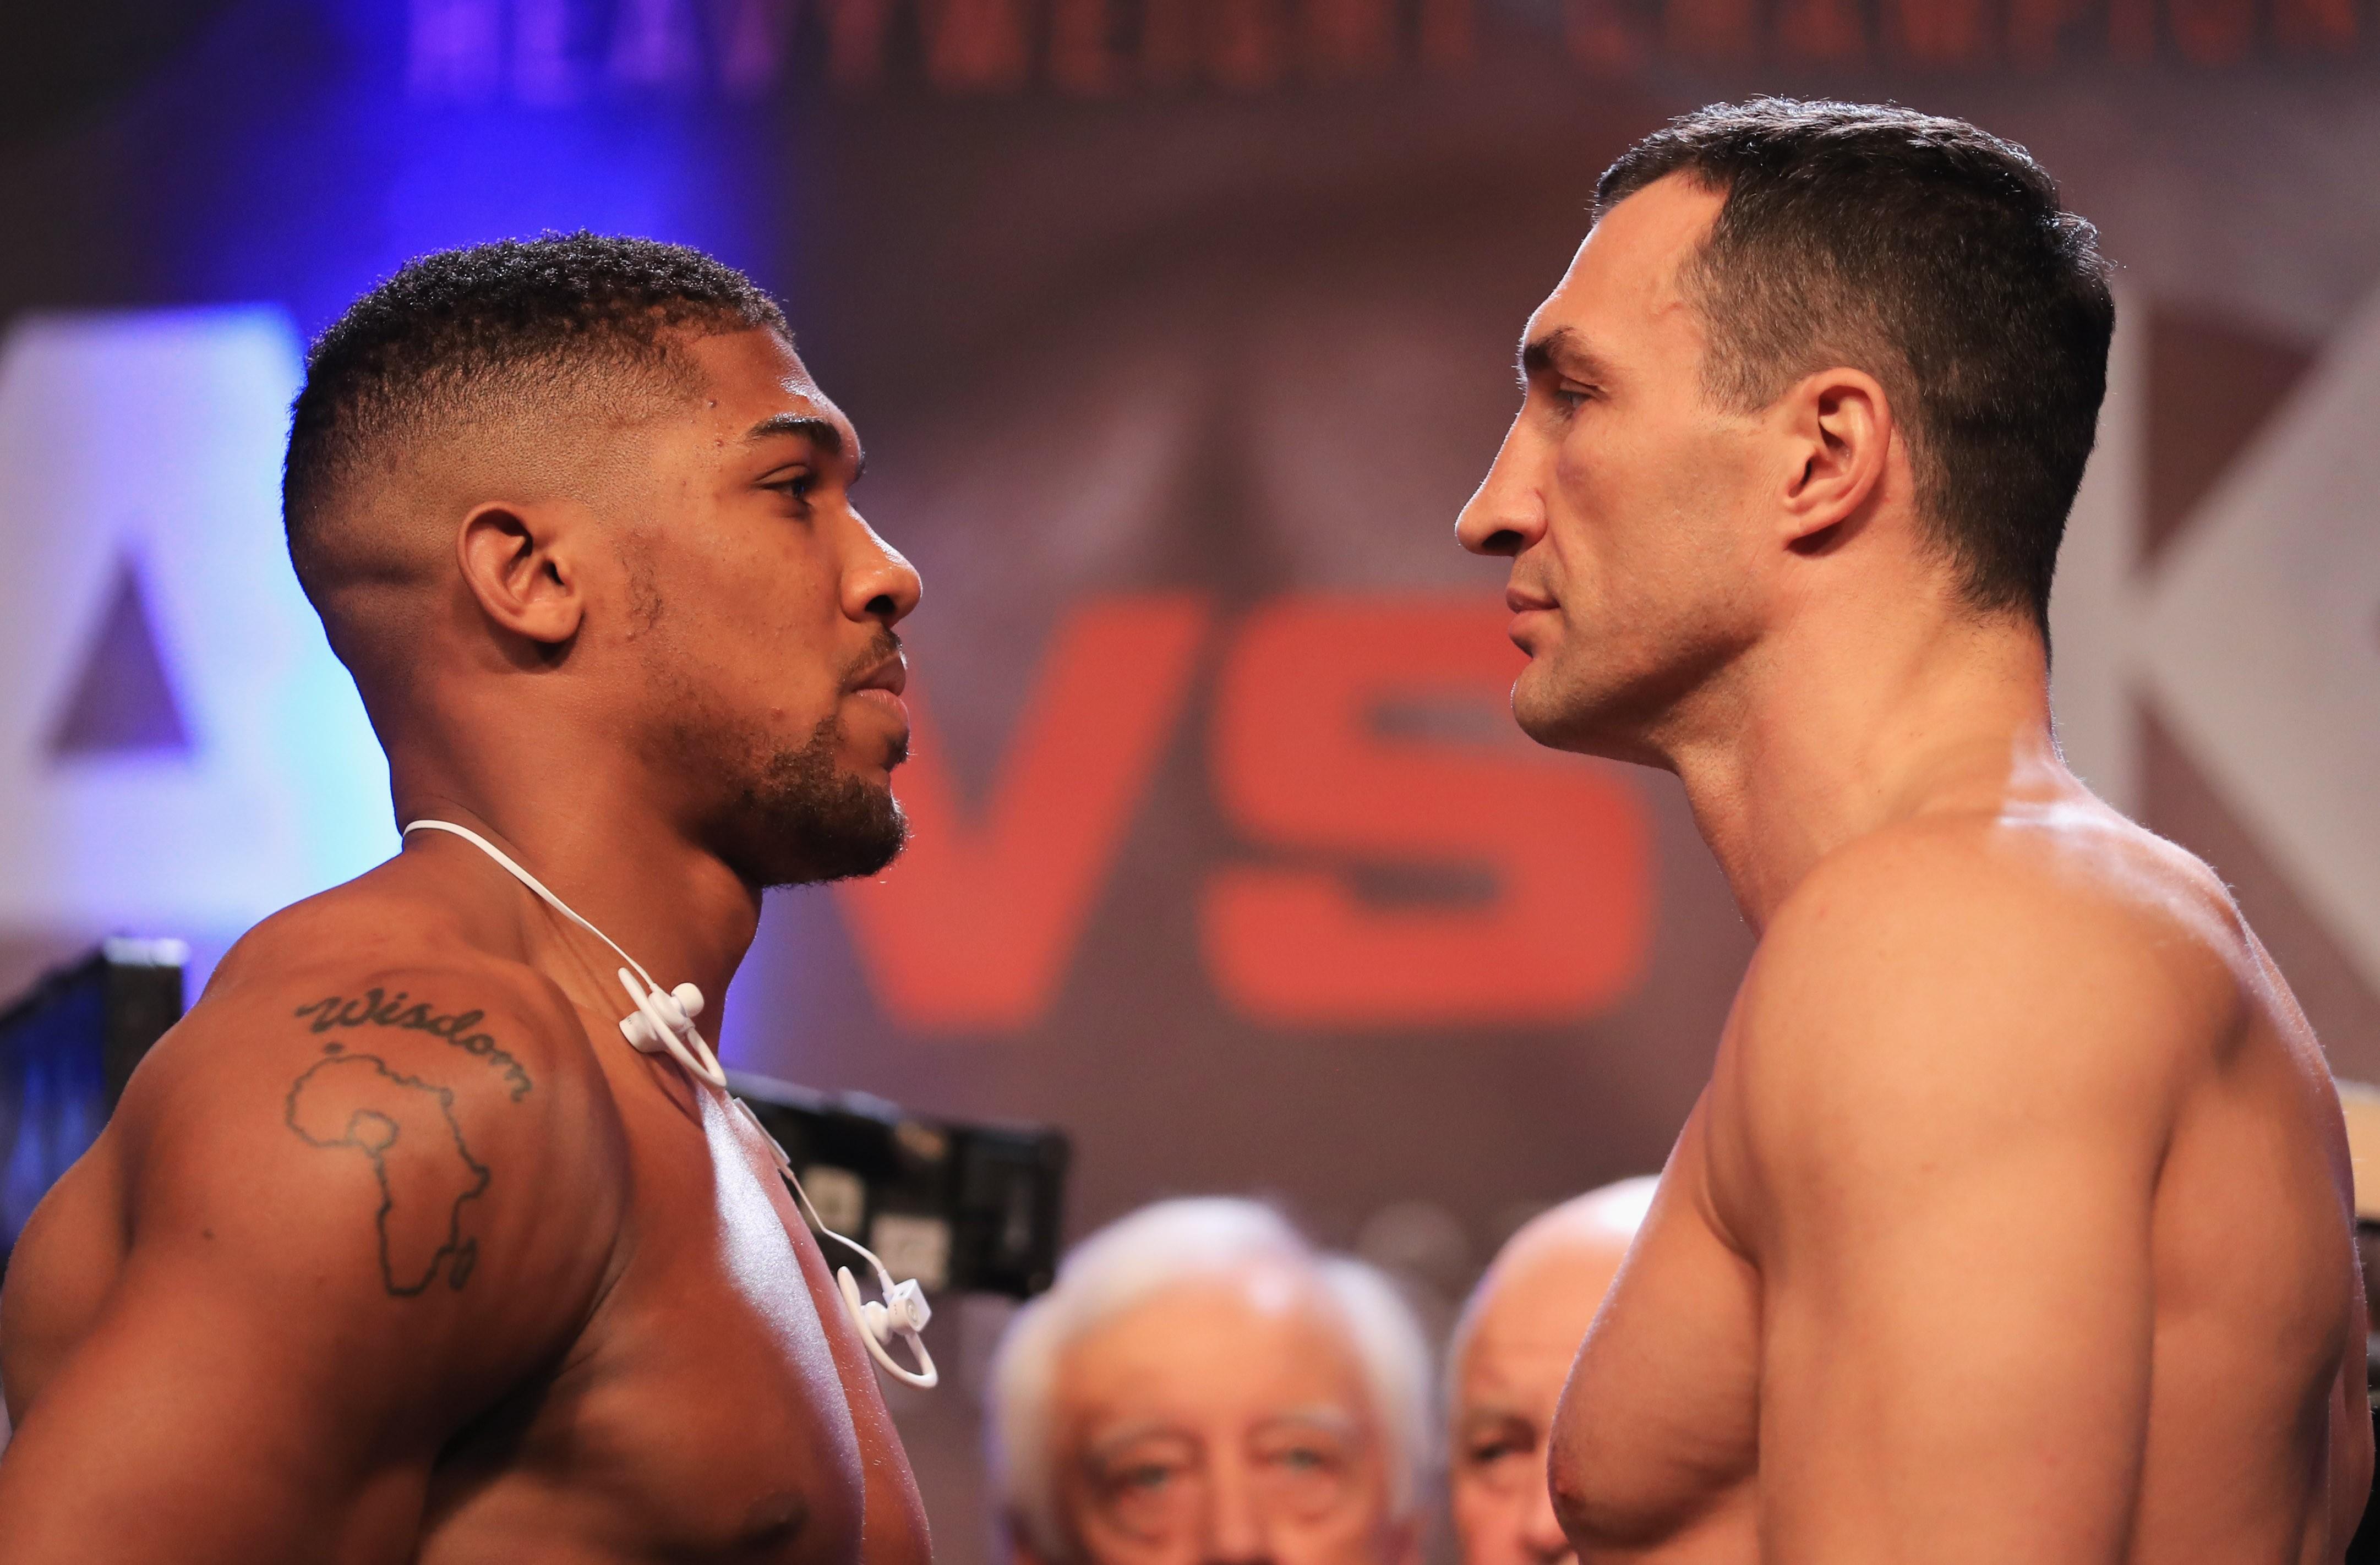 Anthony Joshua e Wladimir Klitschko se encaram antes da luta imperdível (Foto: Getty Images / Richard Heathcote)